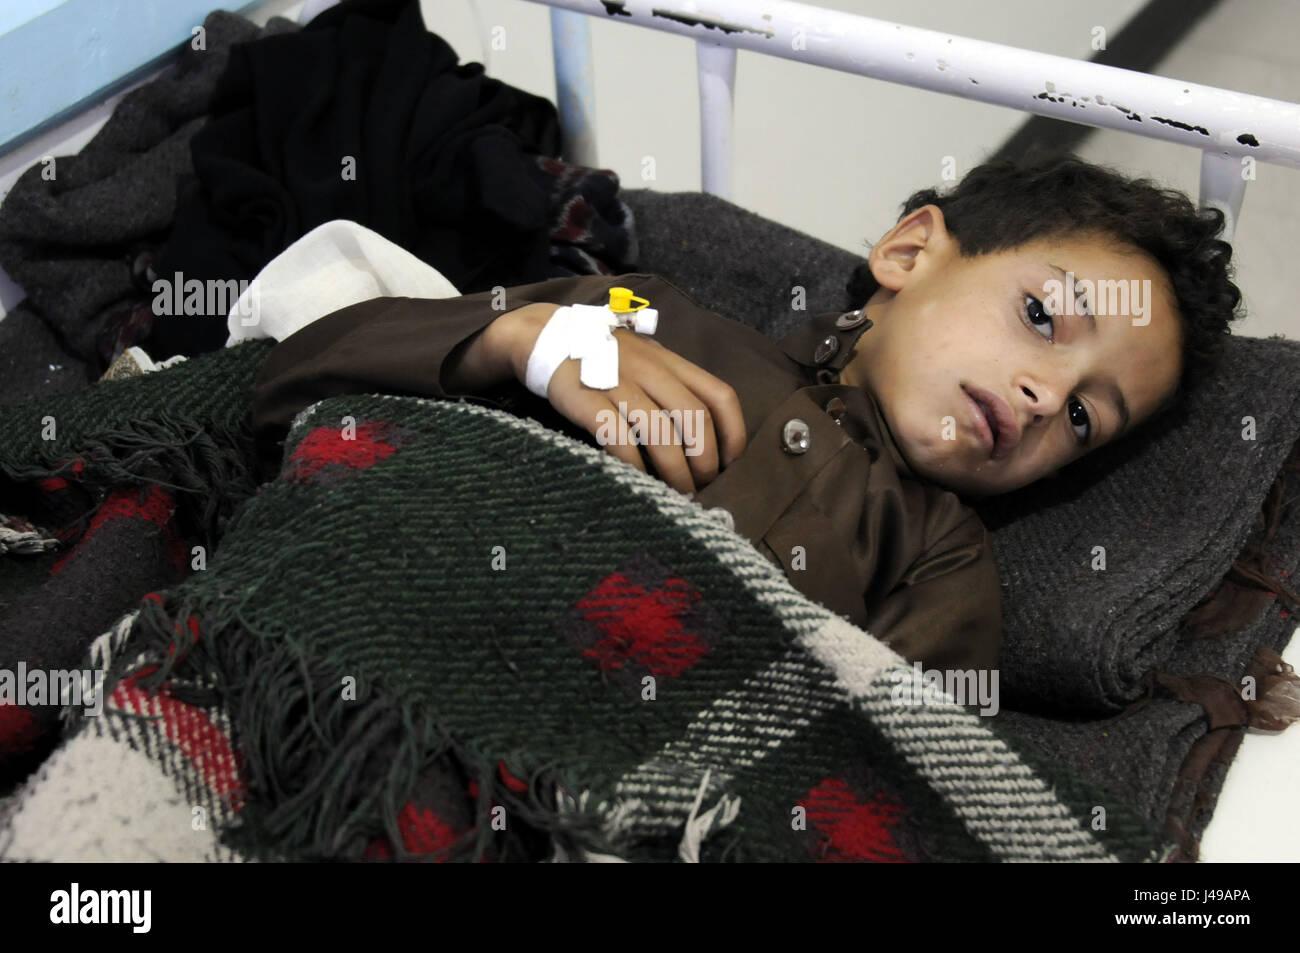 Sanaa, Yemen. 10th May, 2017. A boy suffering from cholera gets treatment in a hospital in Sanaa, Yemen, on May - Stock Image